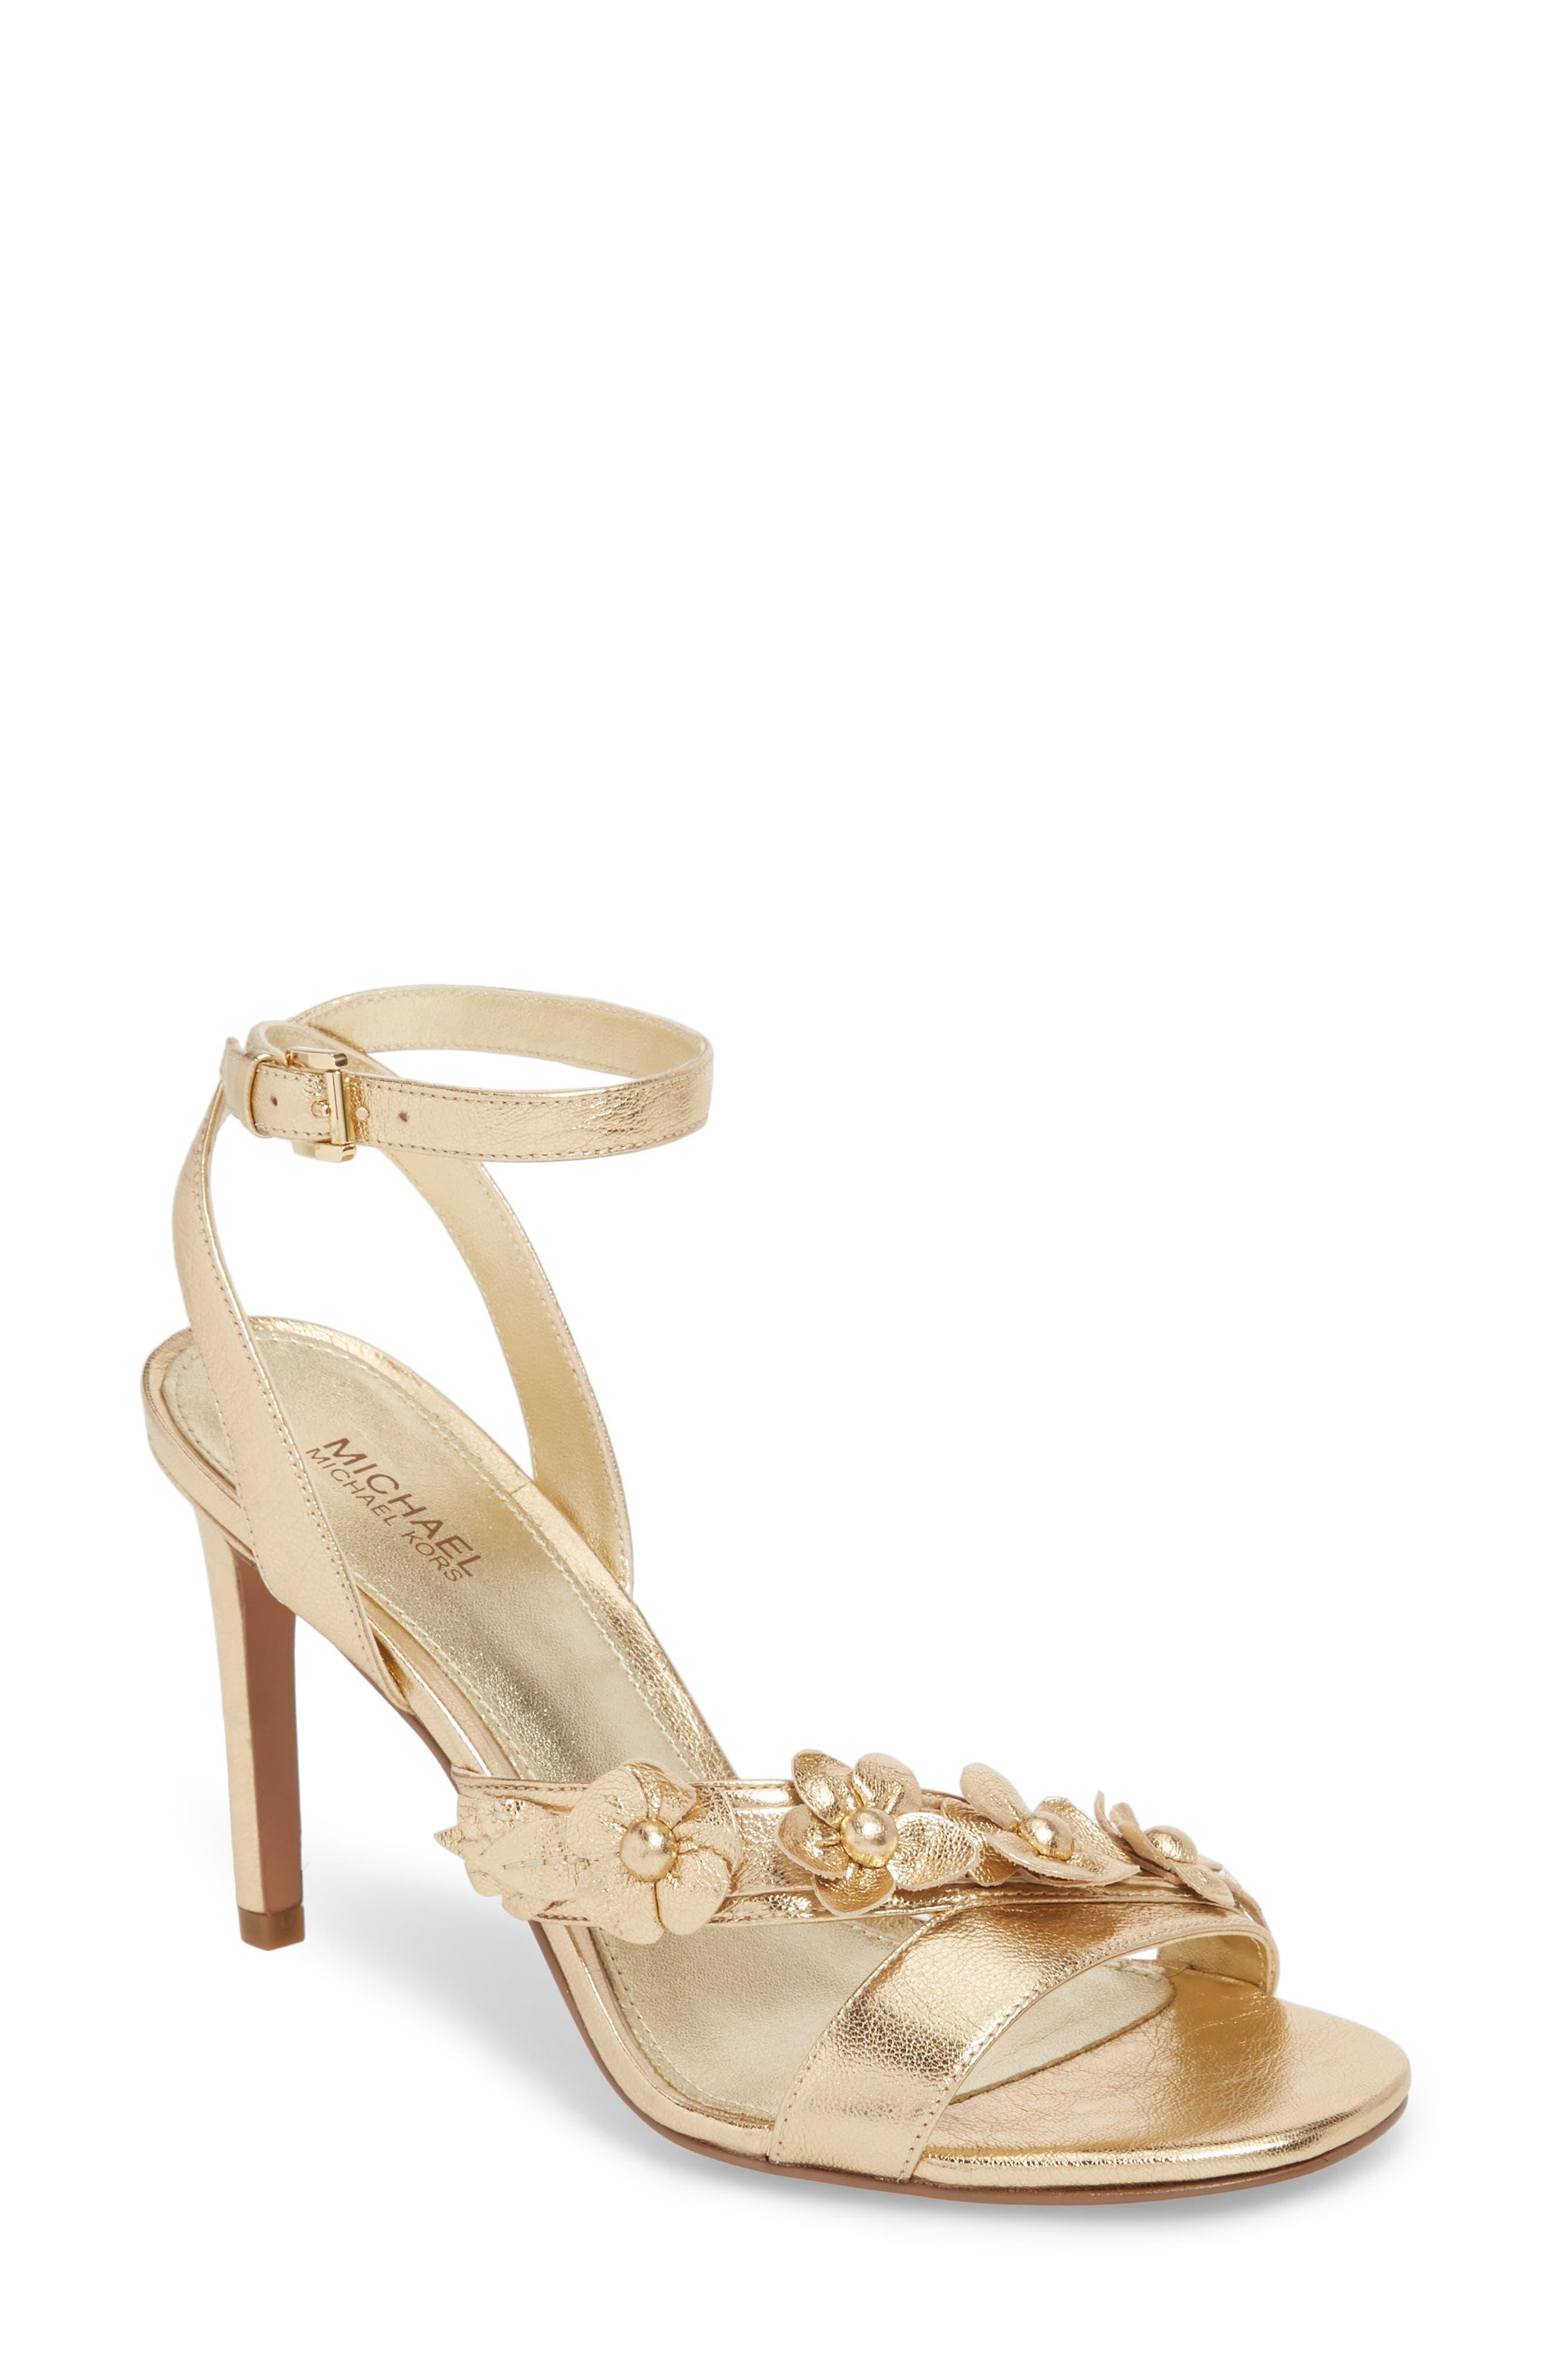 Tricia Sandal,                         Main,                         color, Pale Gold Leather